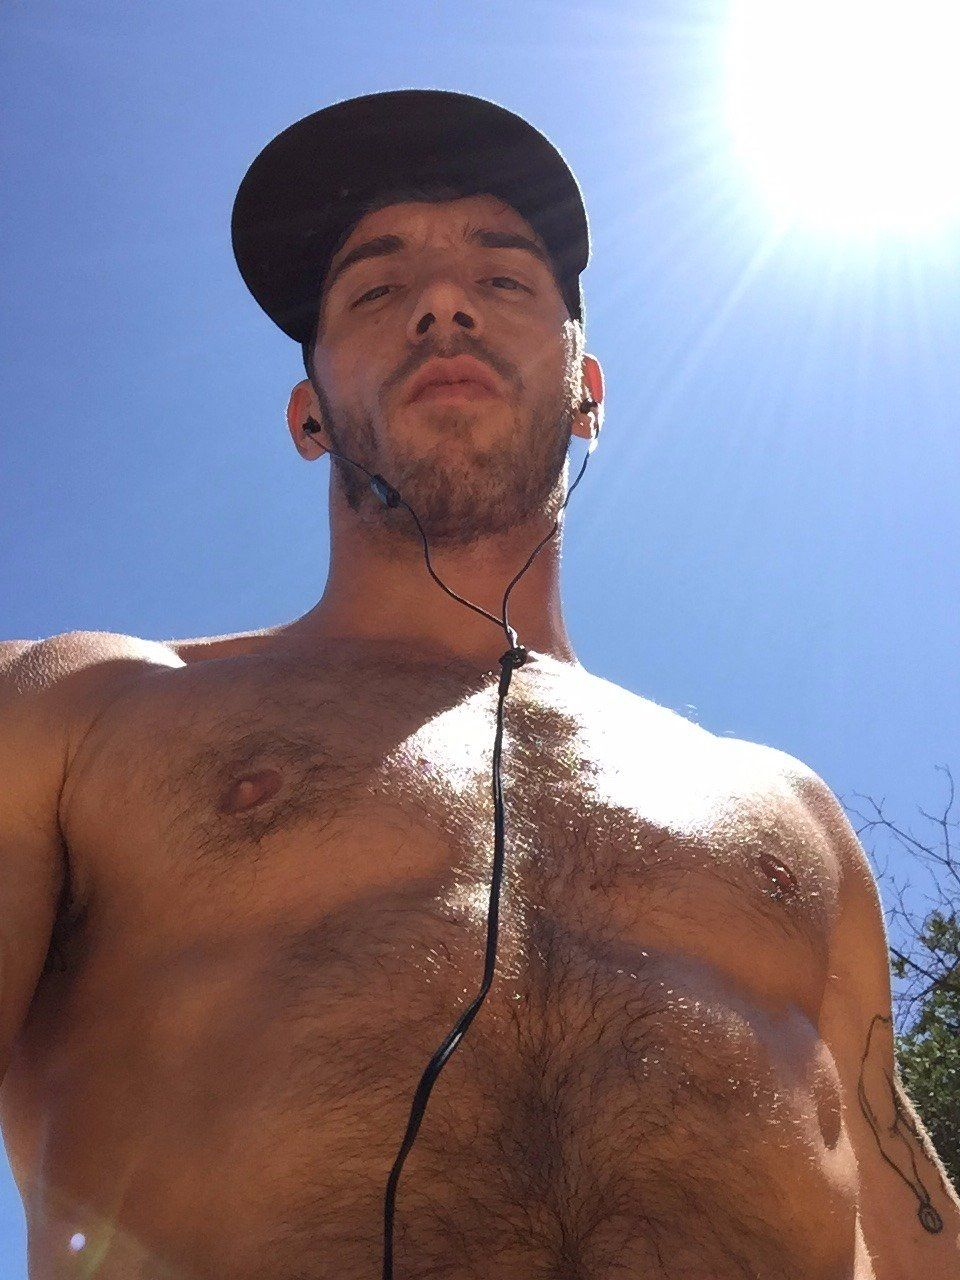 more Men cumming in underwear like tall macho